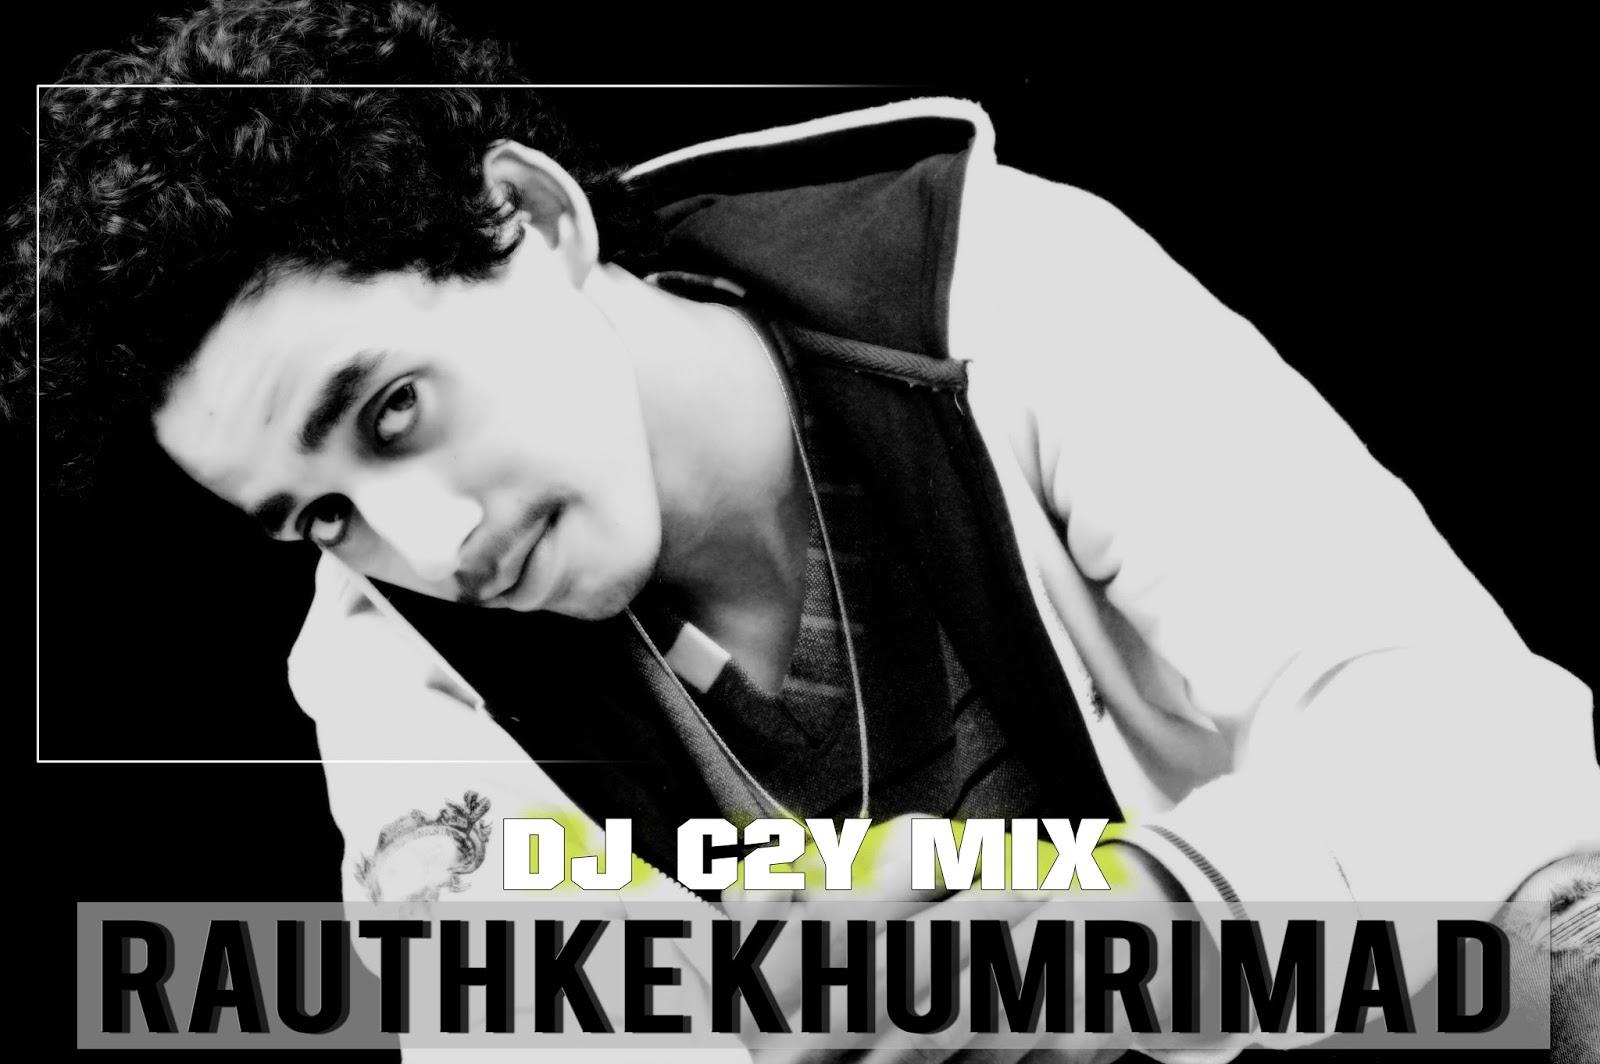 RAUTH KE KHUMRI MA REMIX DJ C2Y - DJ C2Y